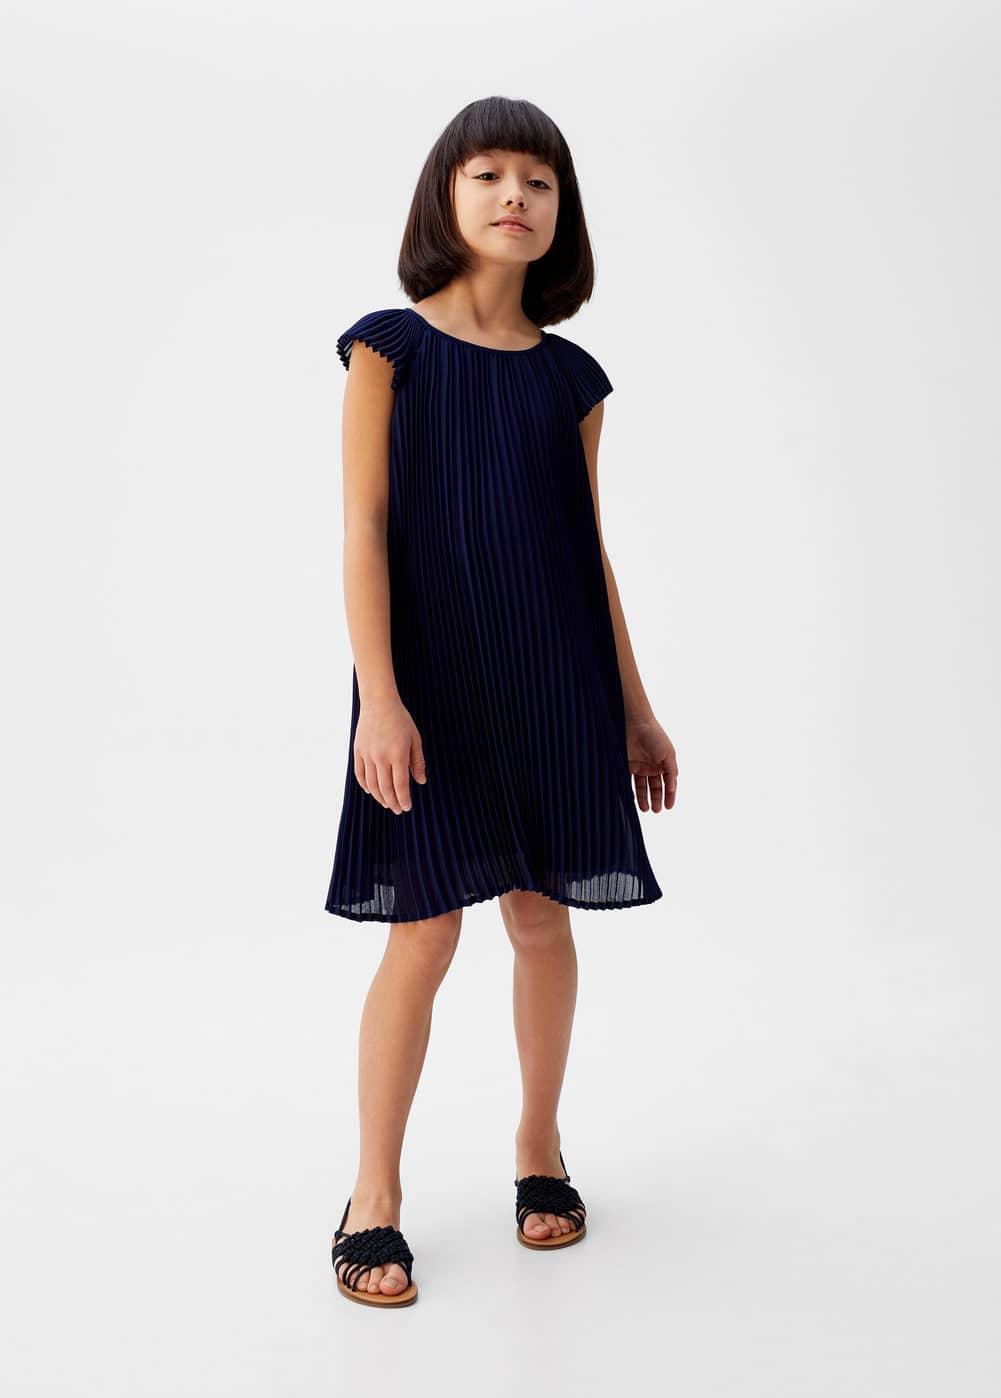 a-pleat:vestido tablas